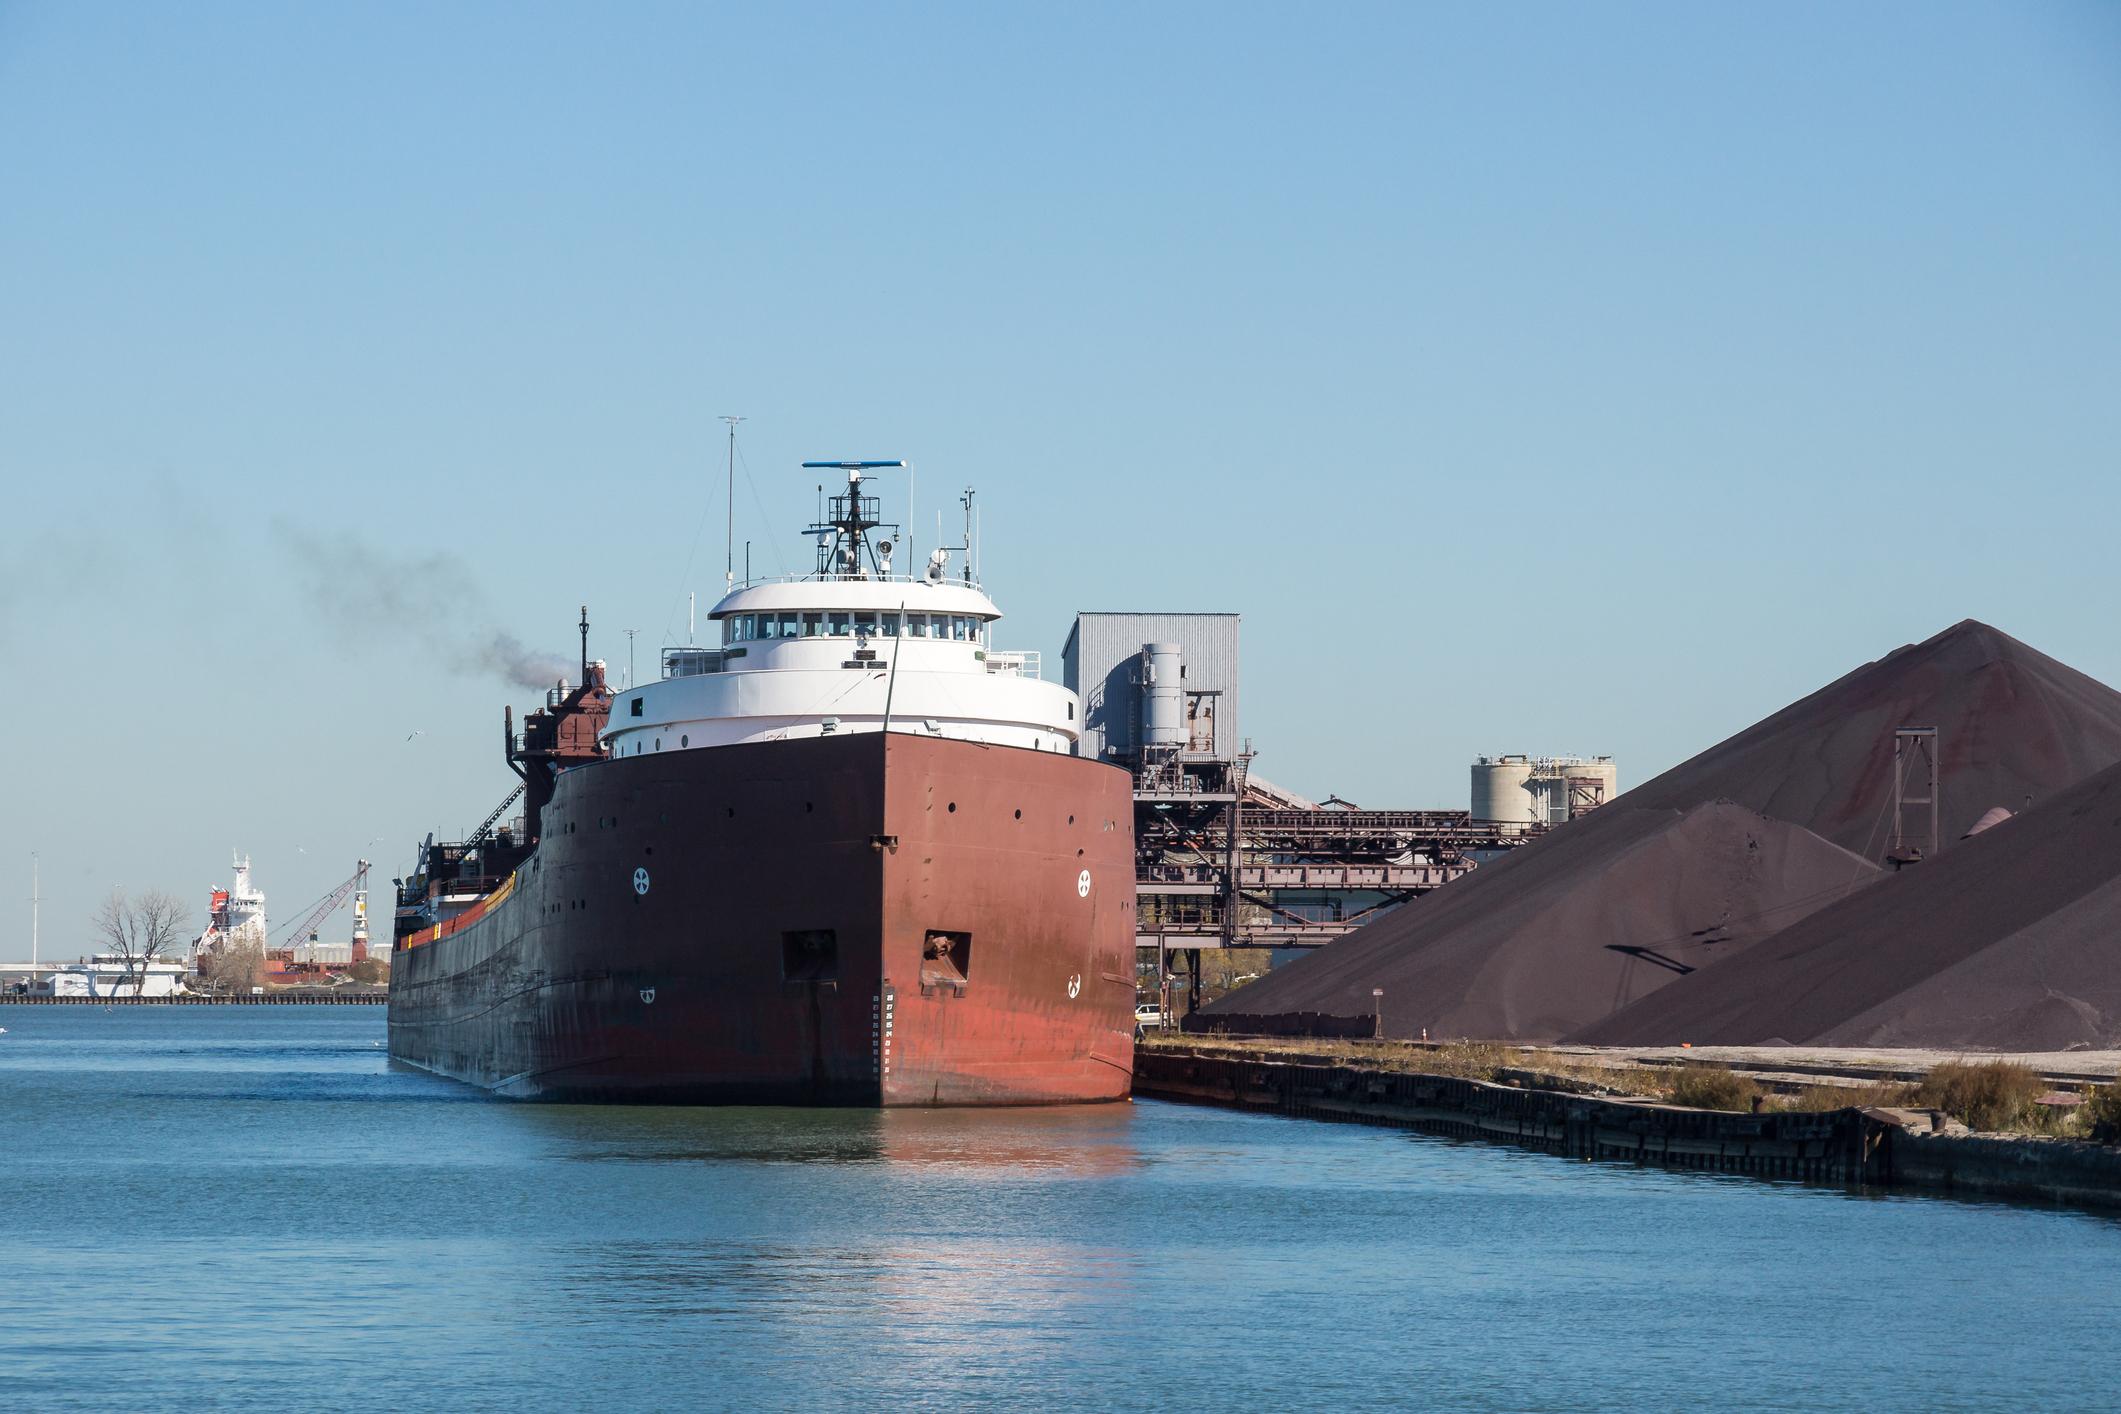 Dry bulk ship next to pile of coal